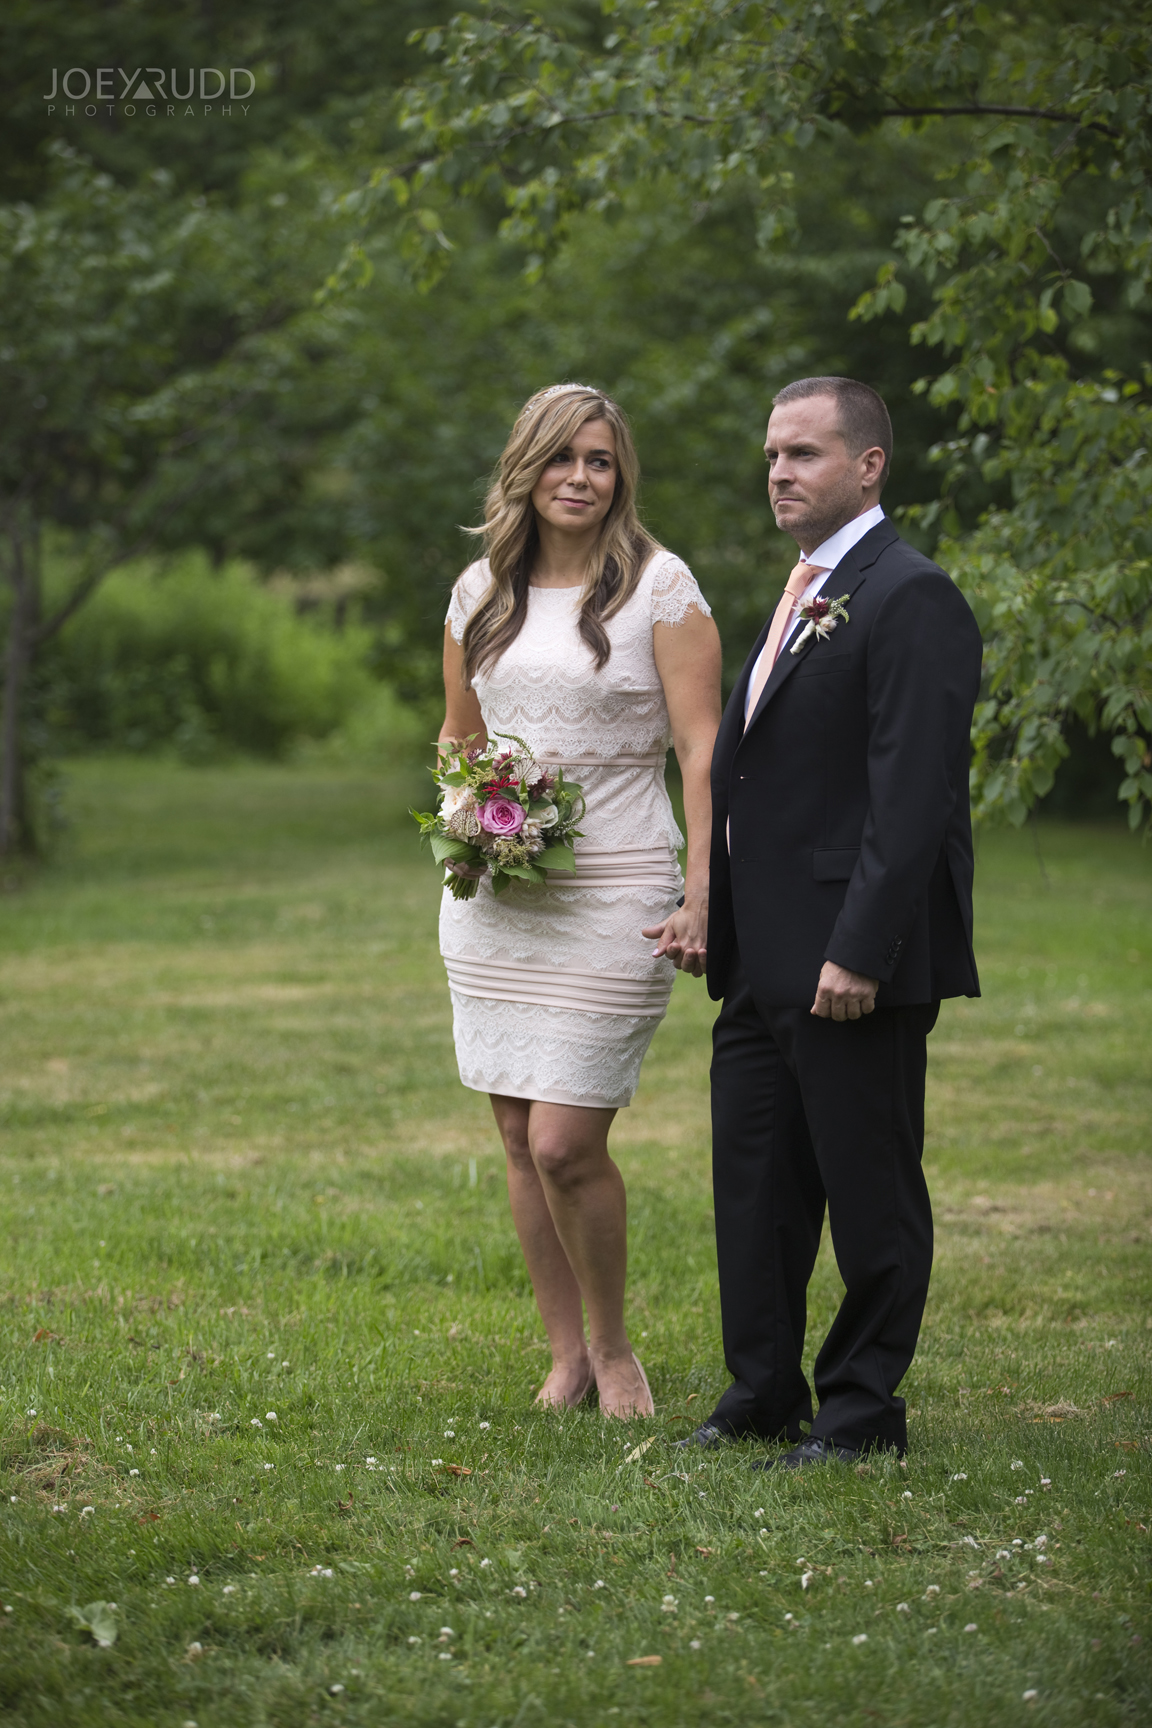 Elopement Wedding by Ottawa Wedding Photographer Joey Rudd Photography Arboretum Candid